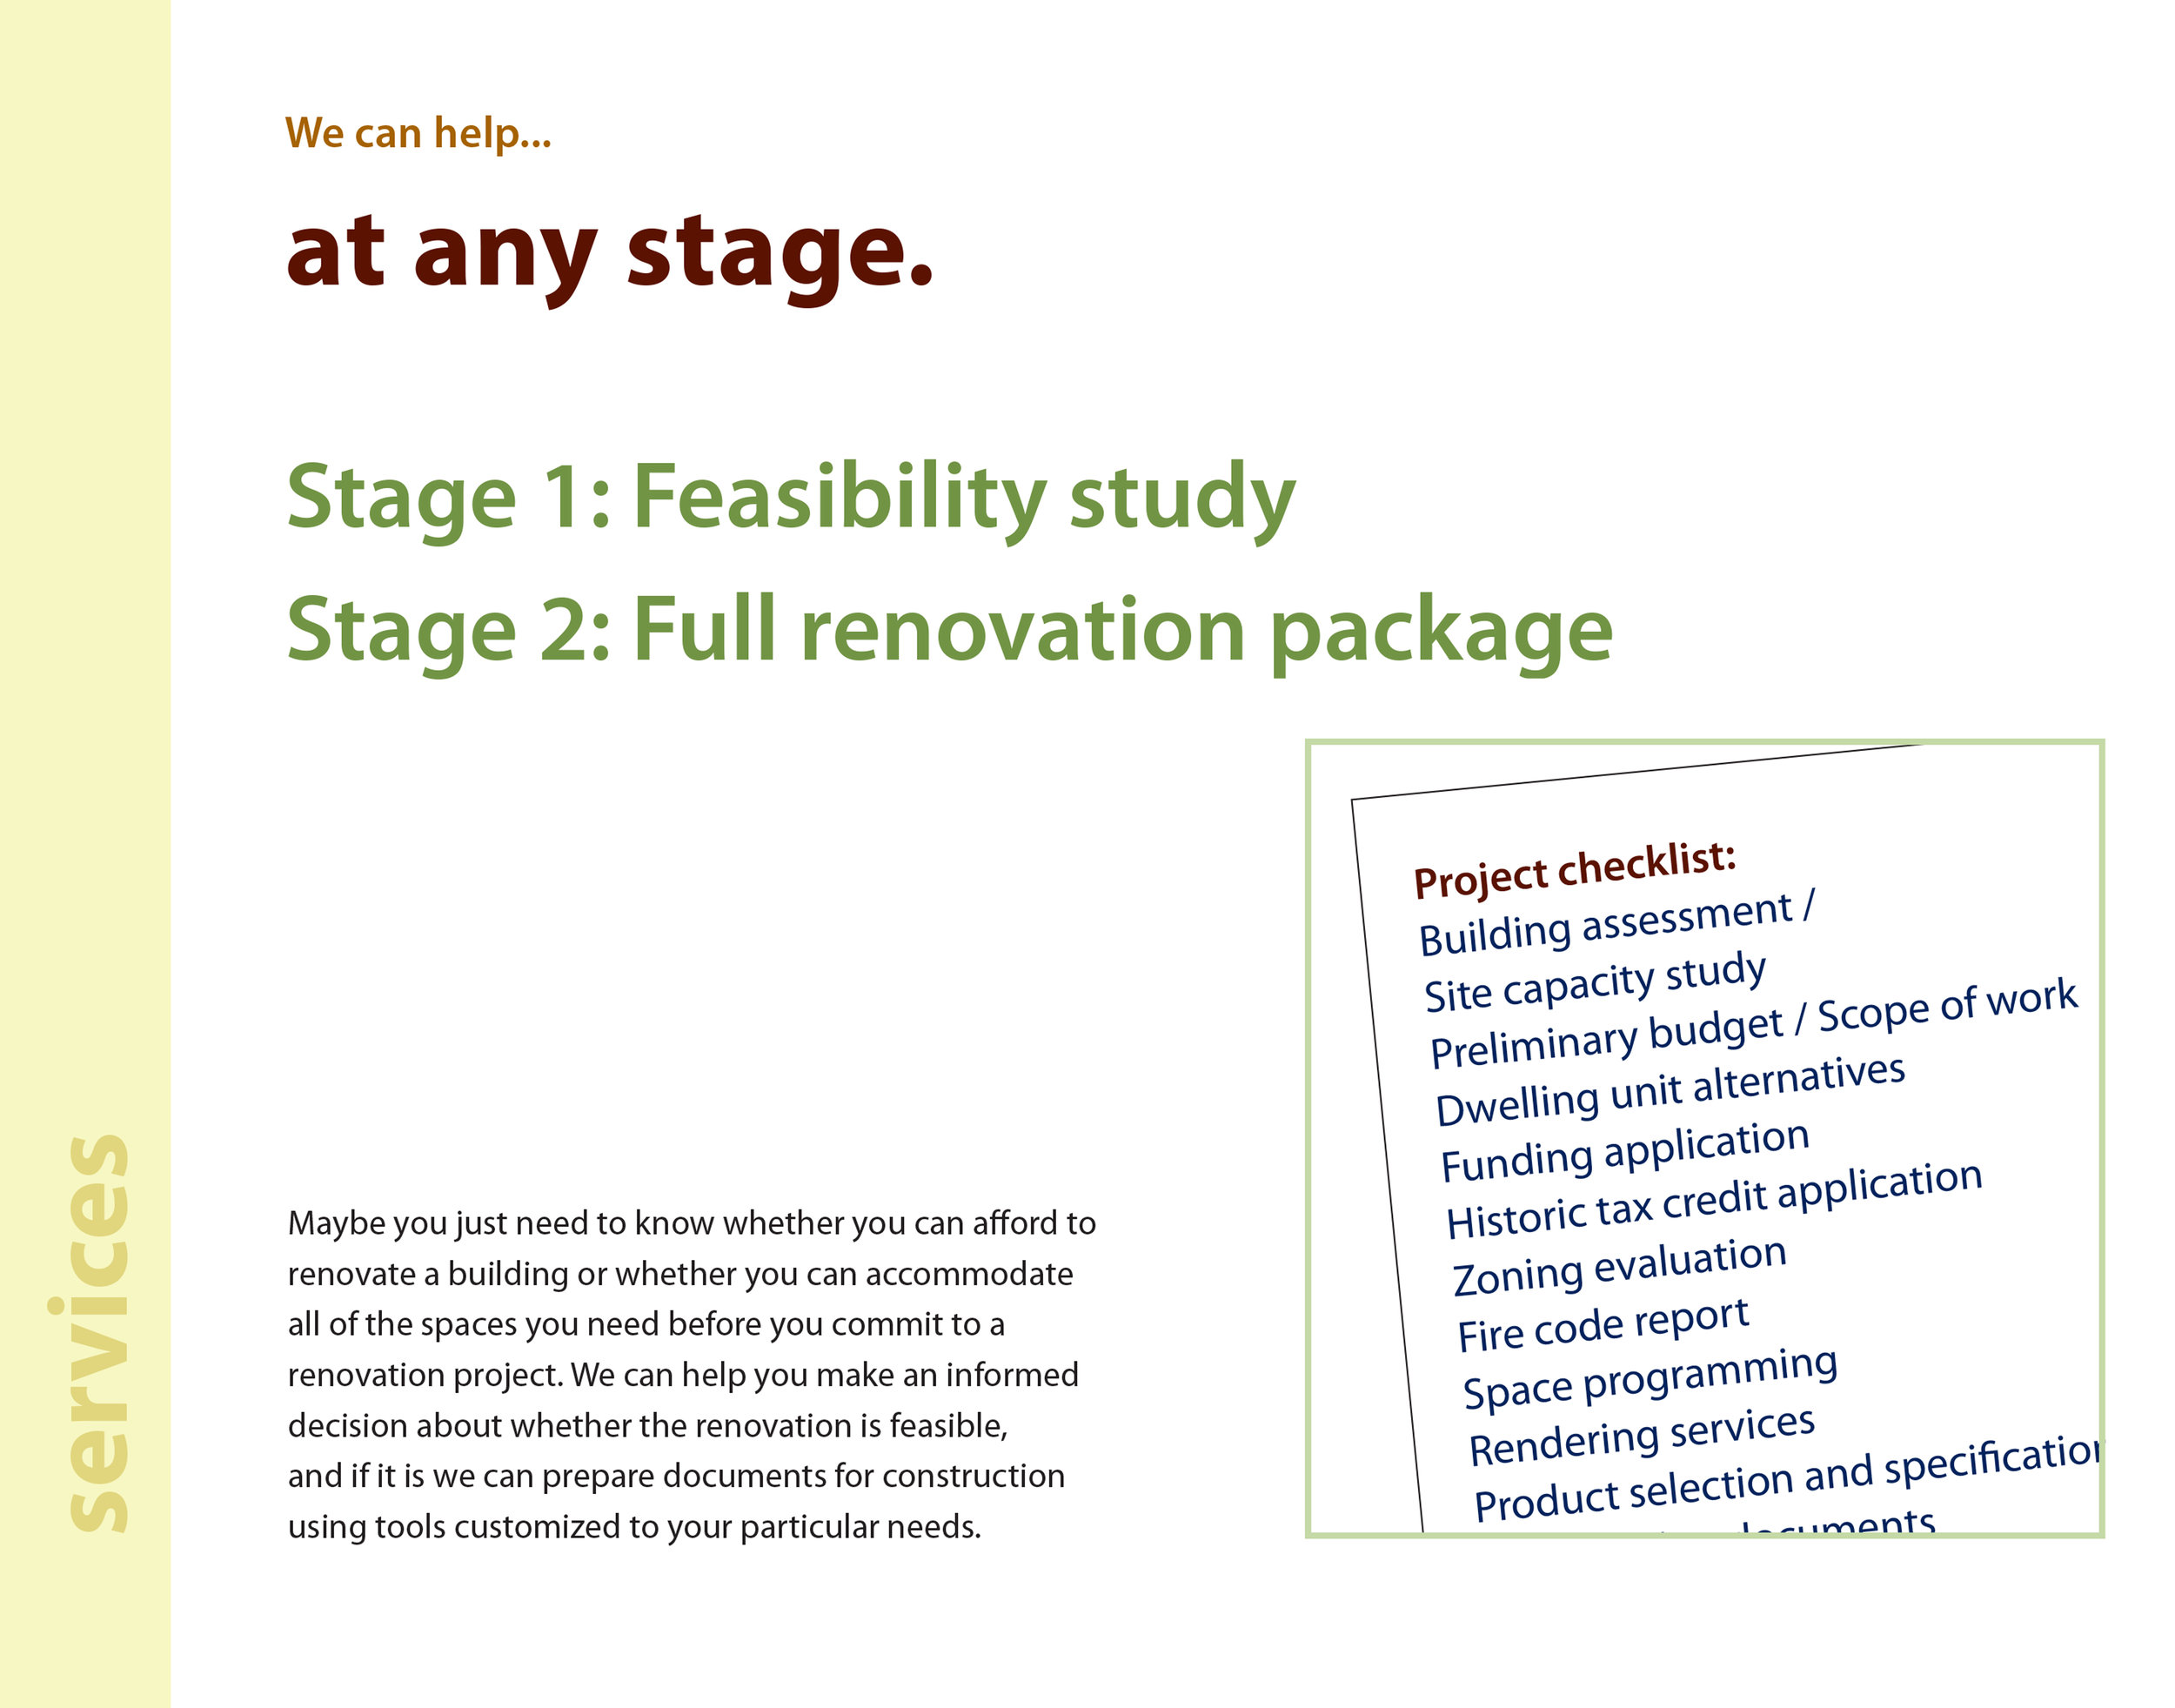 CRA-Renovation-Serv-print-version 4.jpg